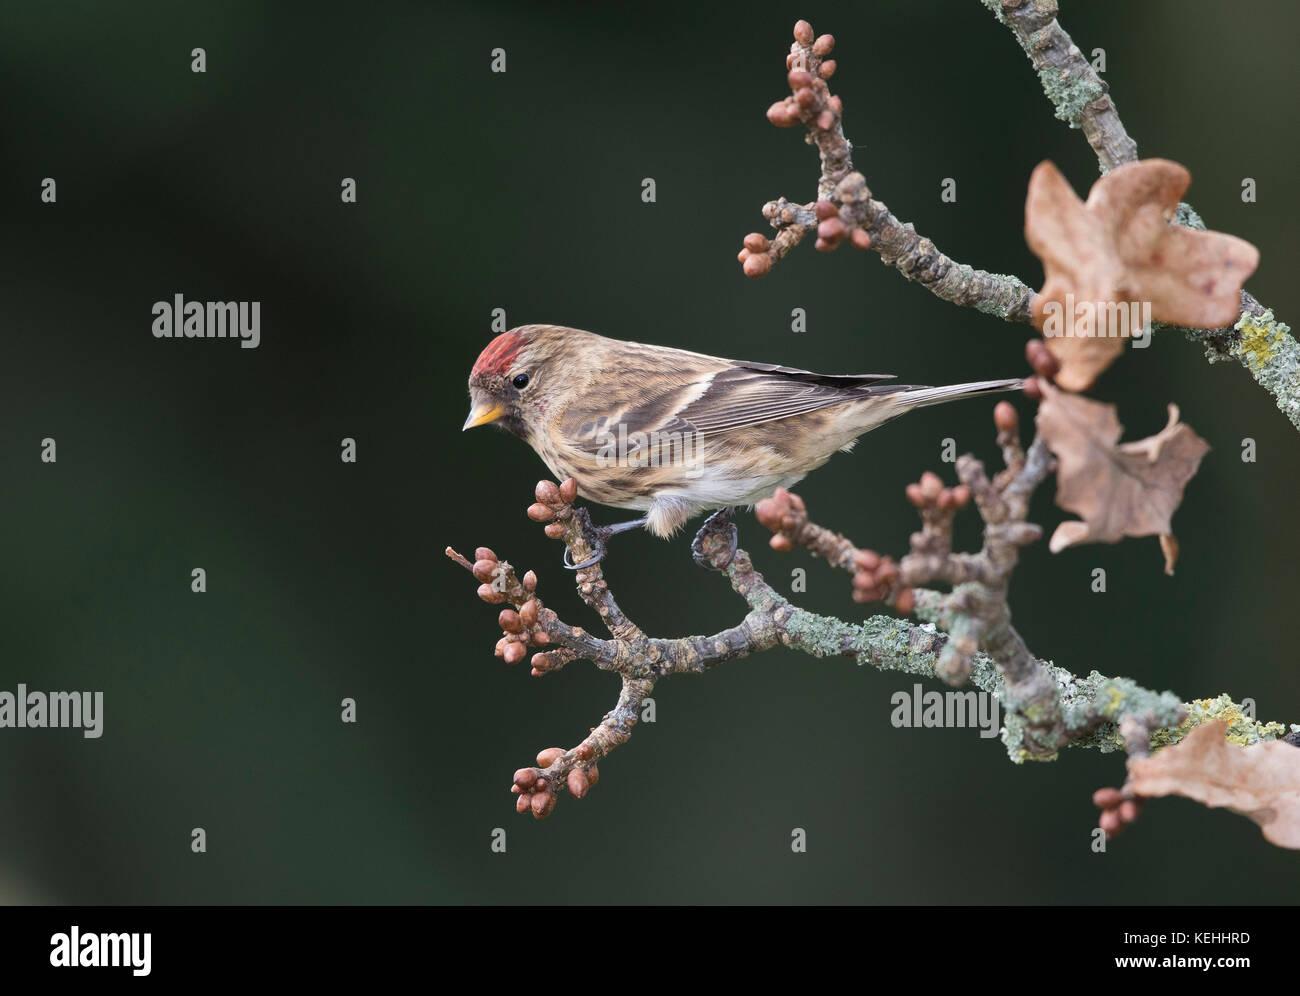 Redpoll feeding on seeds - Stock Image